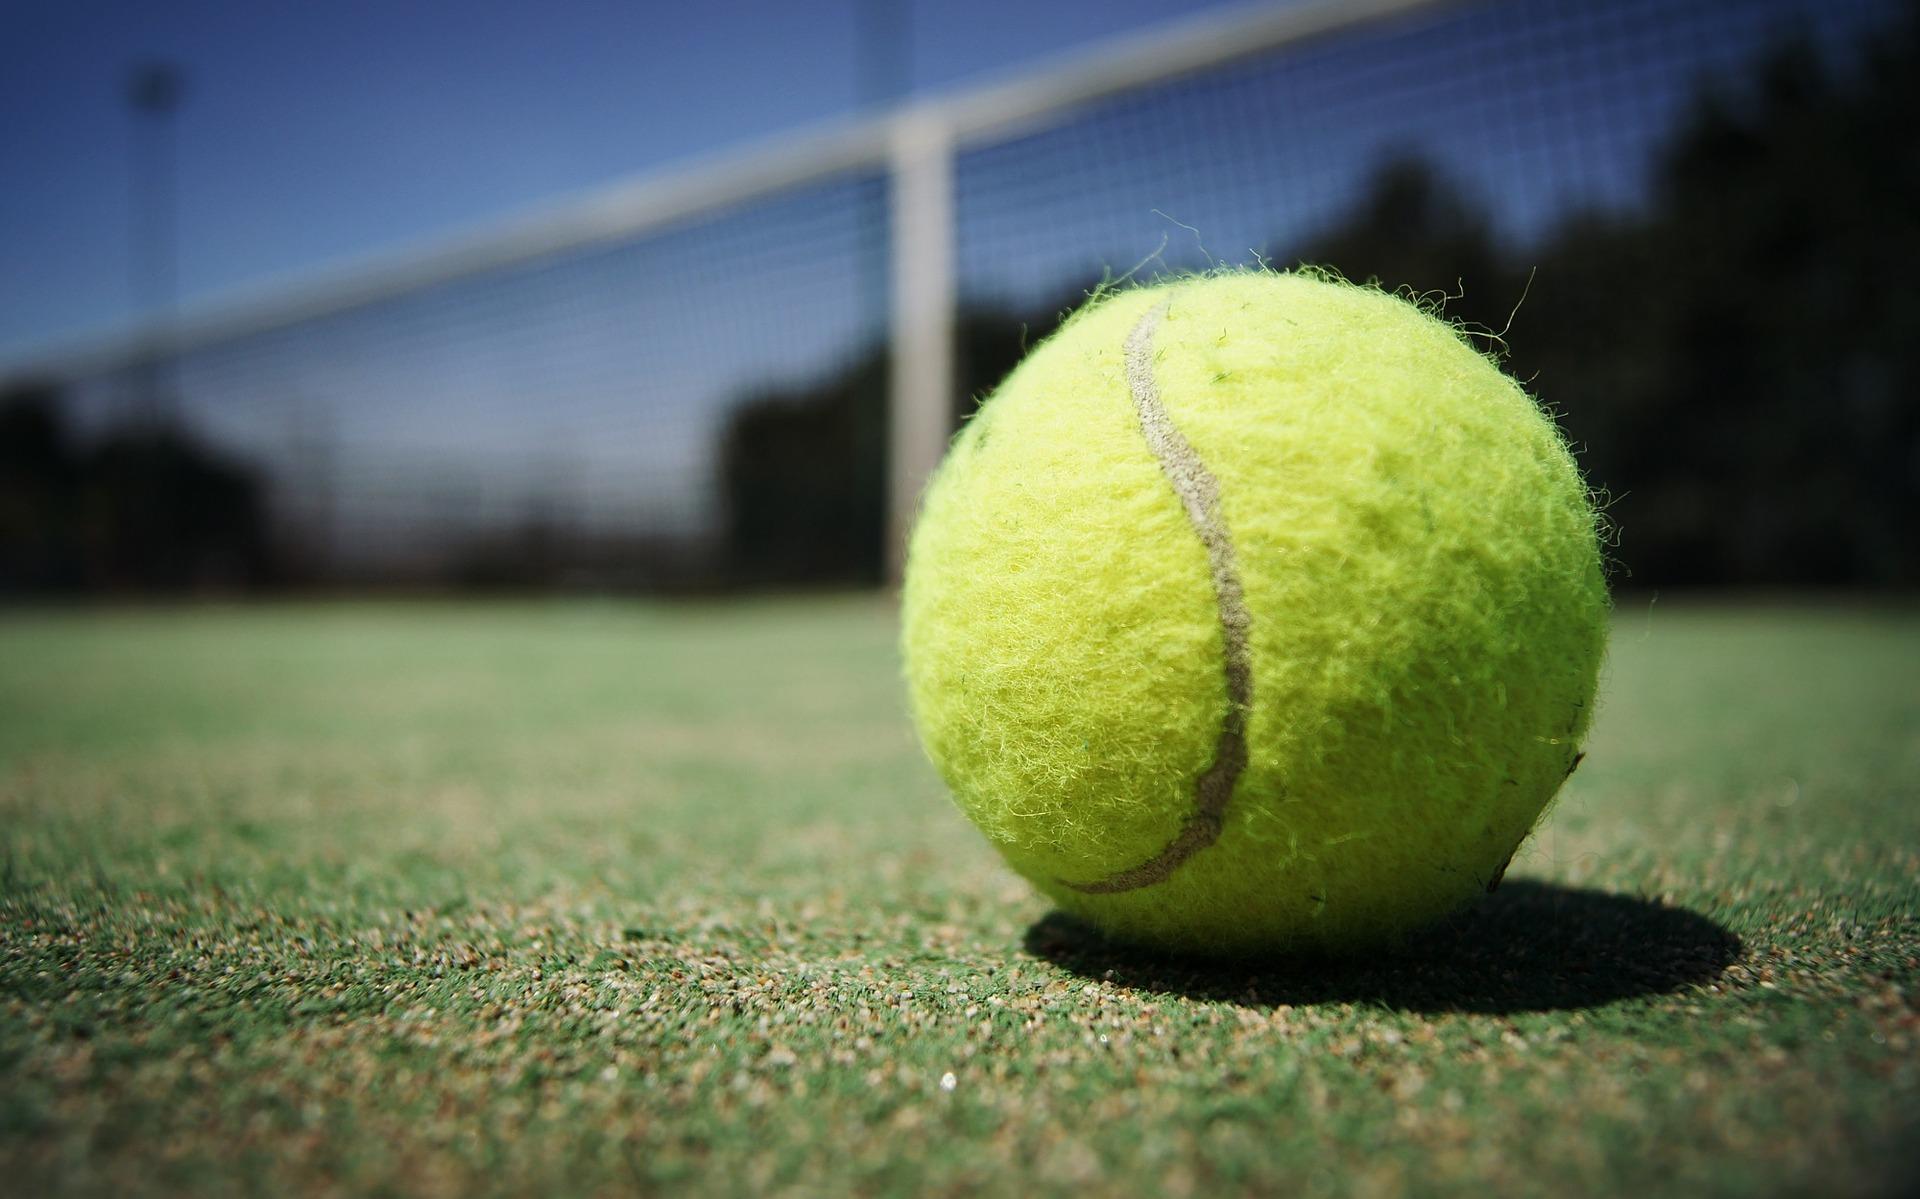 a tennis ball